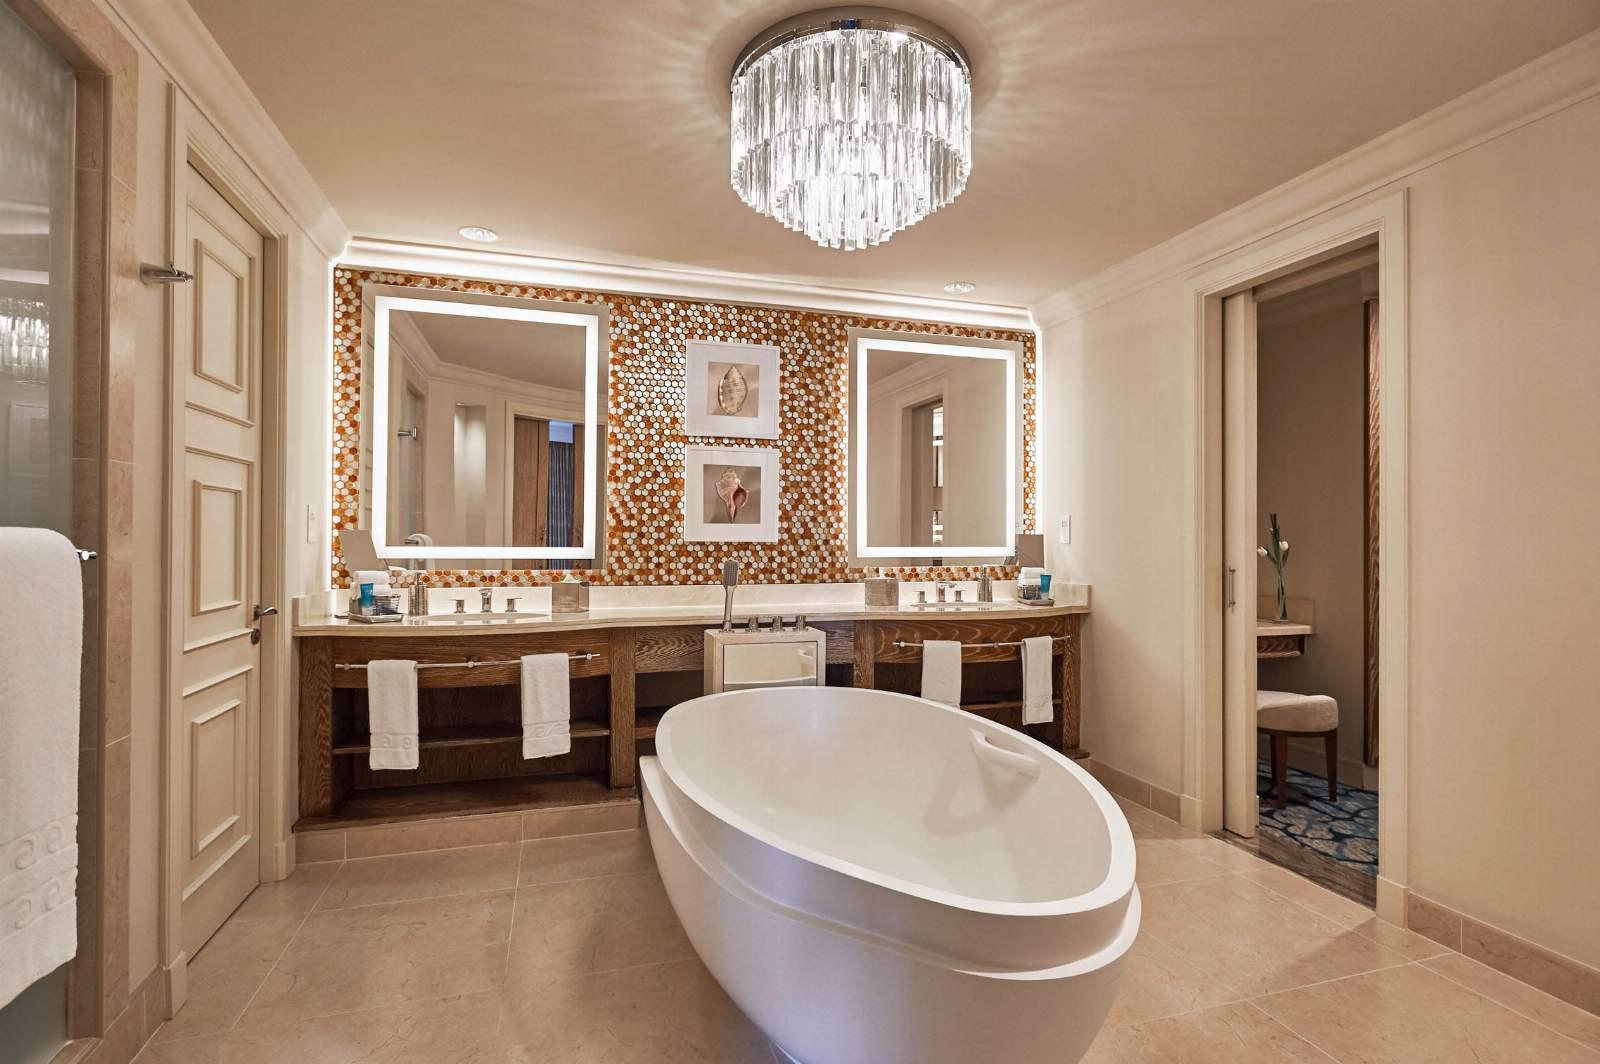 Atlantis, The Palm - Terrace Club Bathroom